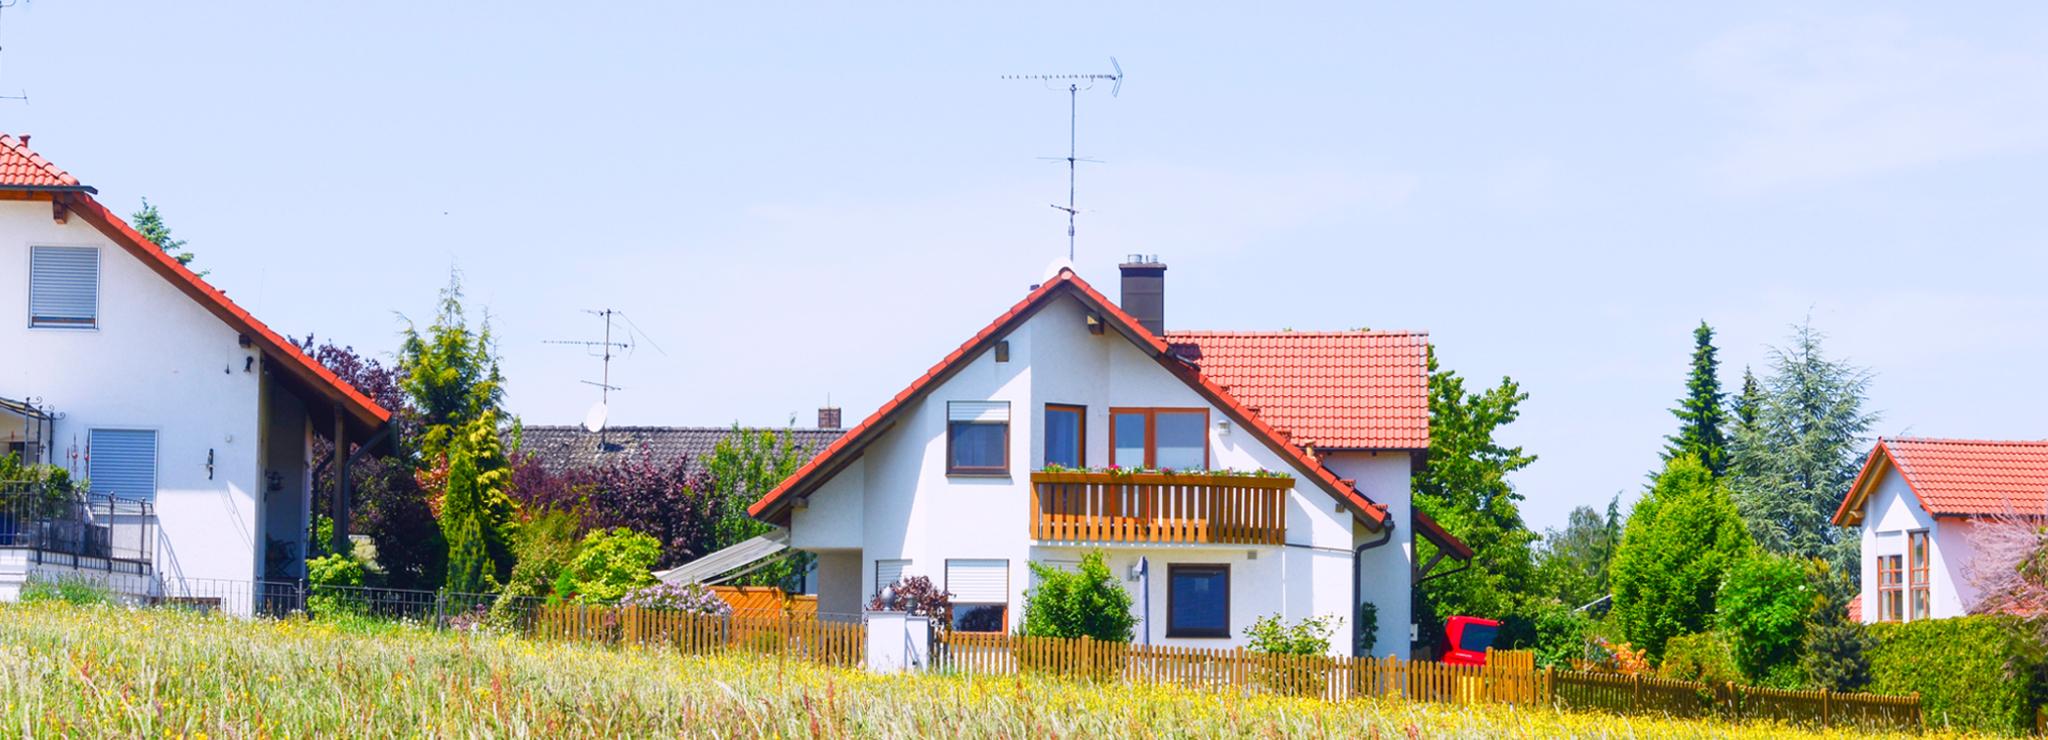 Immobilien - Ratgeber